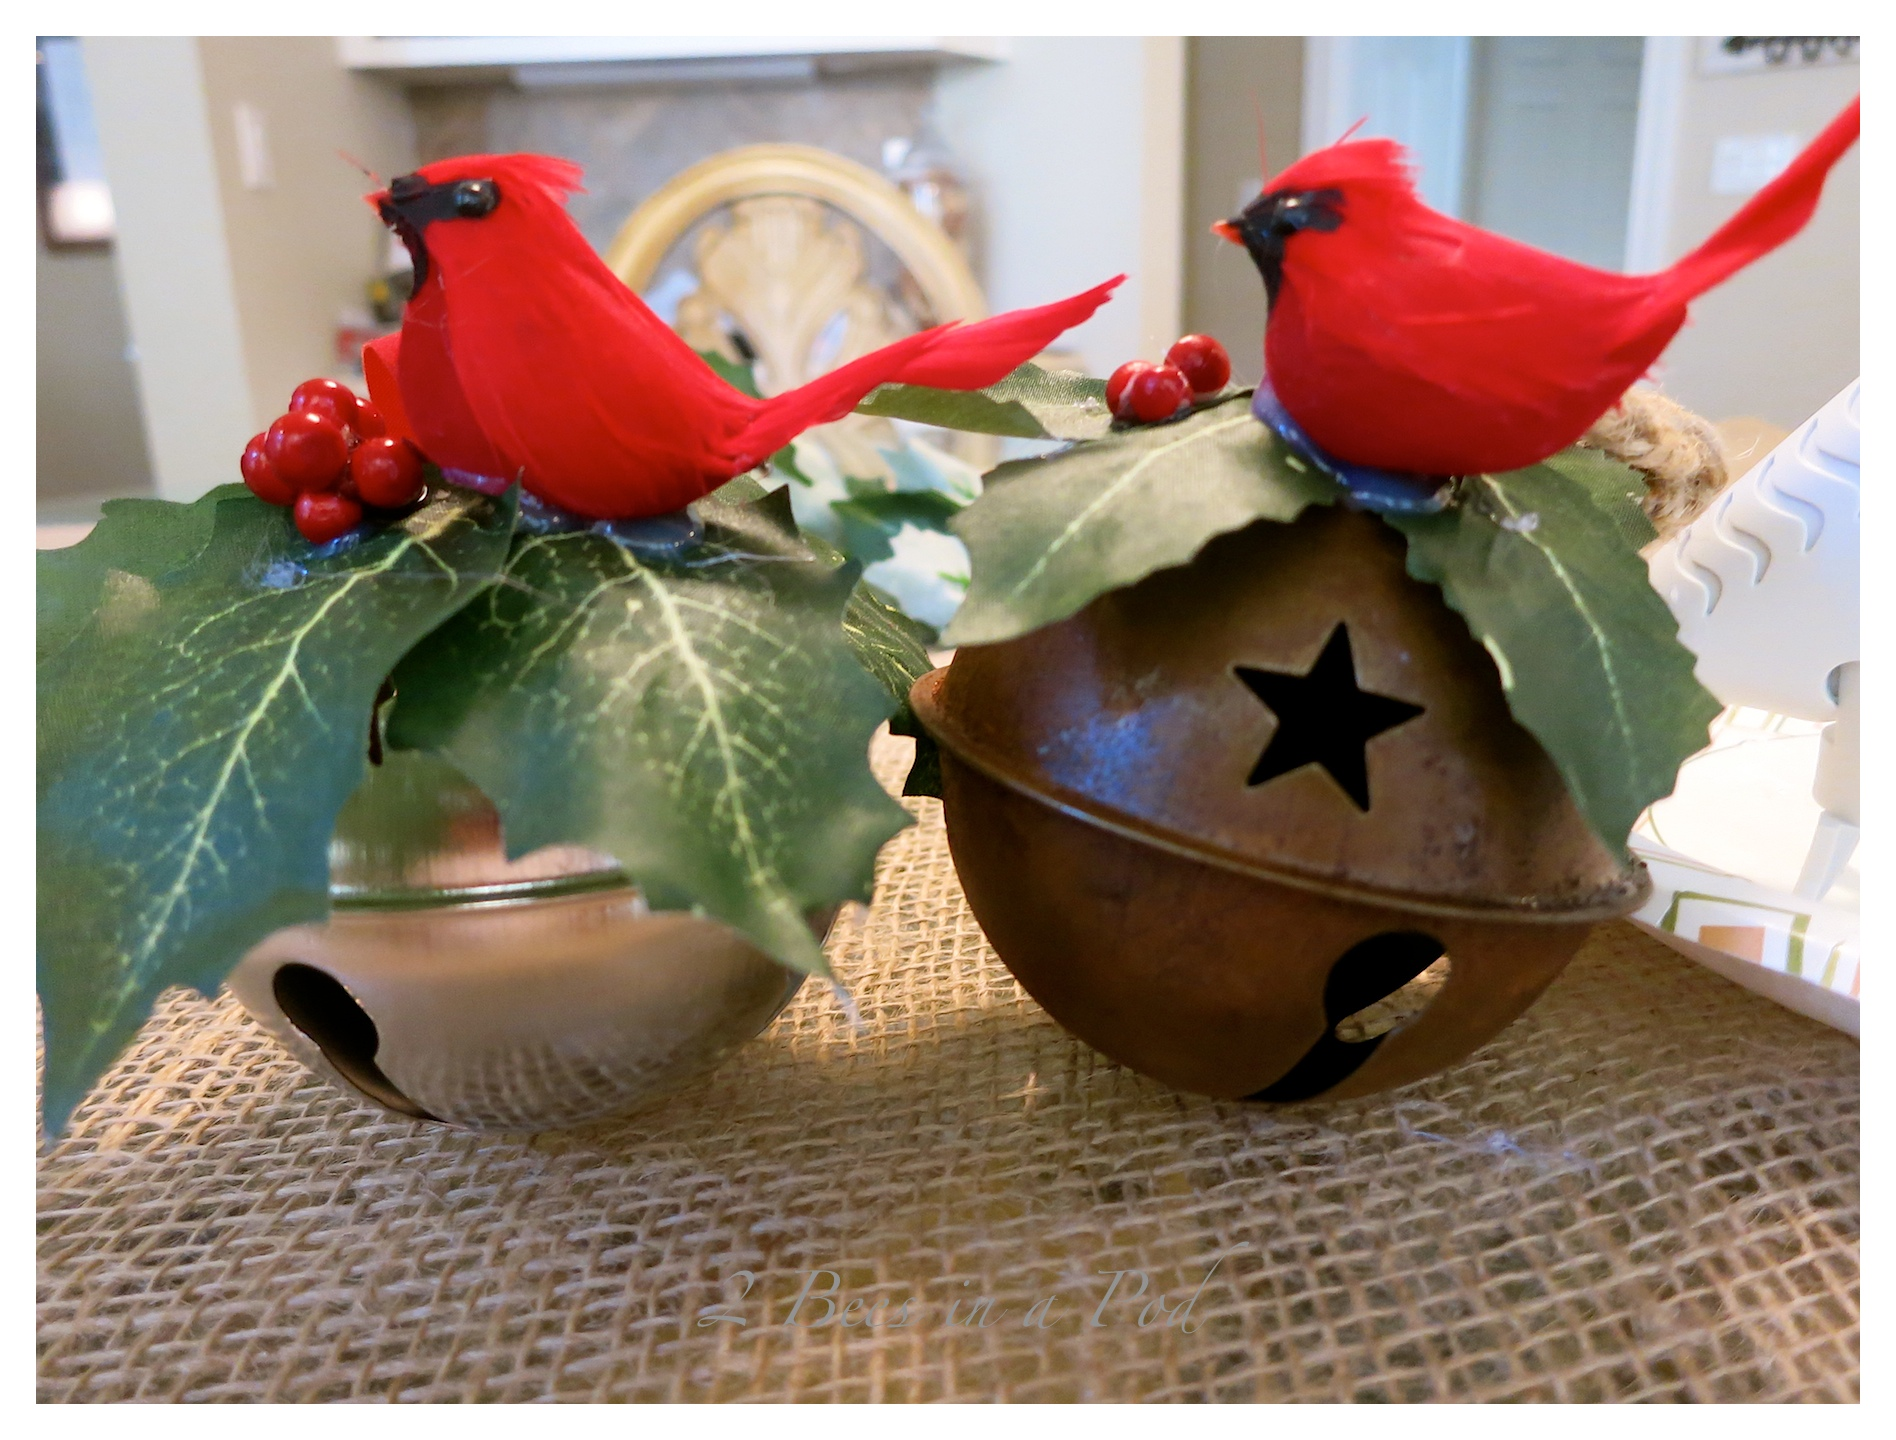 An easy to make Jingle Bell Door hanger - makes an excellent hostess gift!